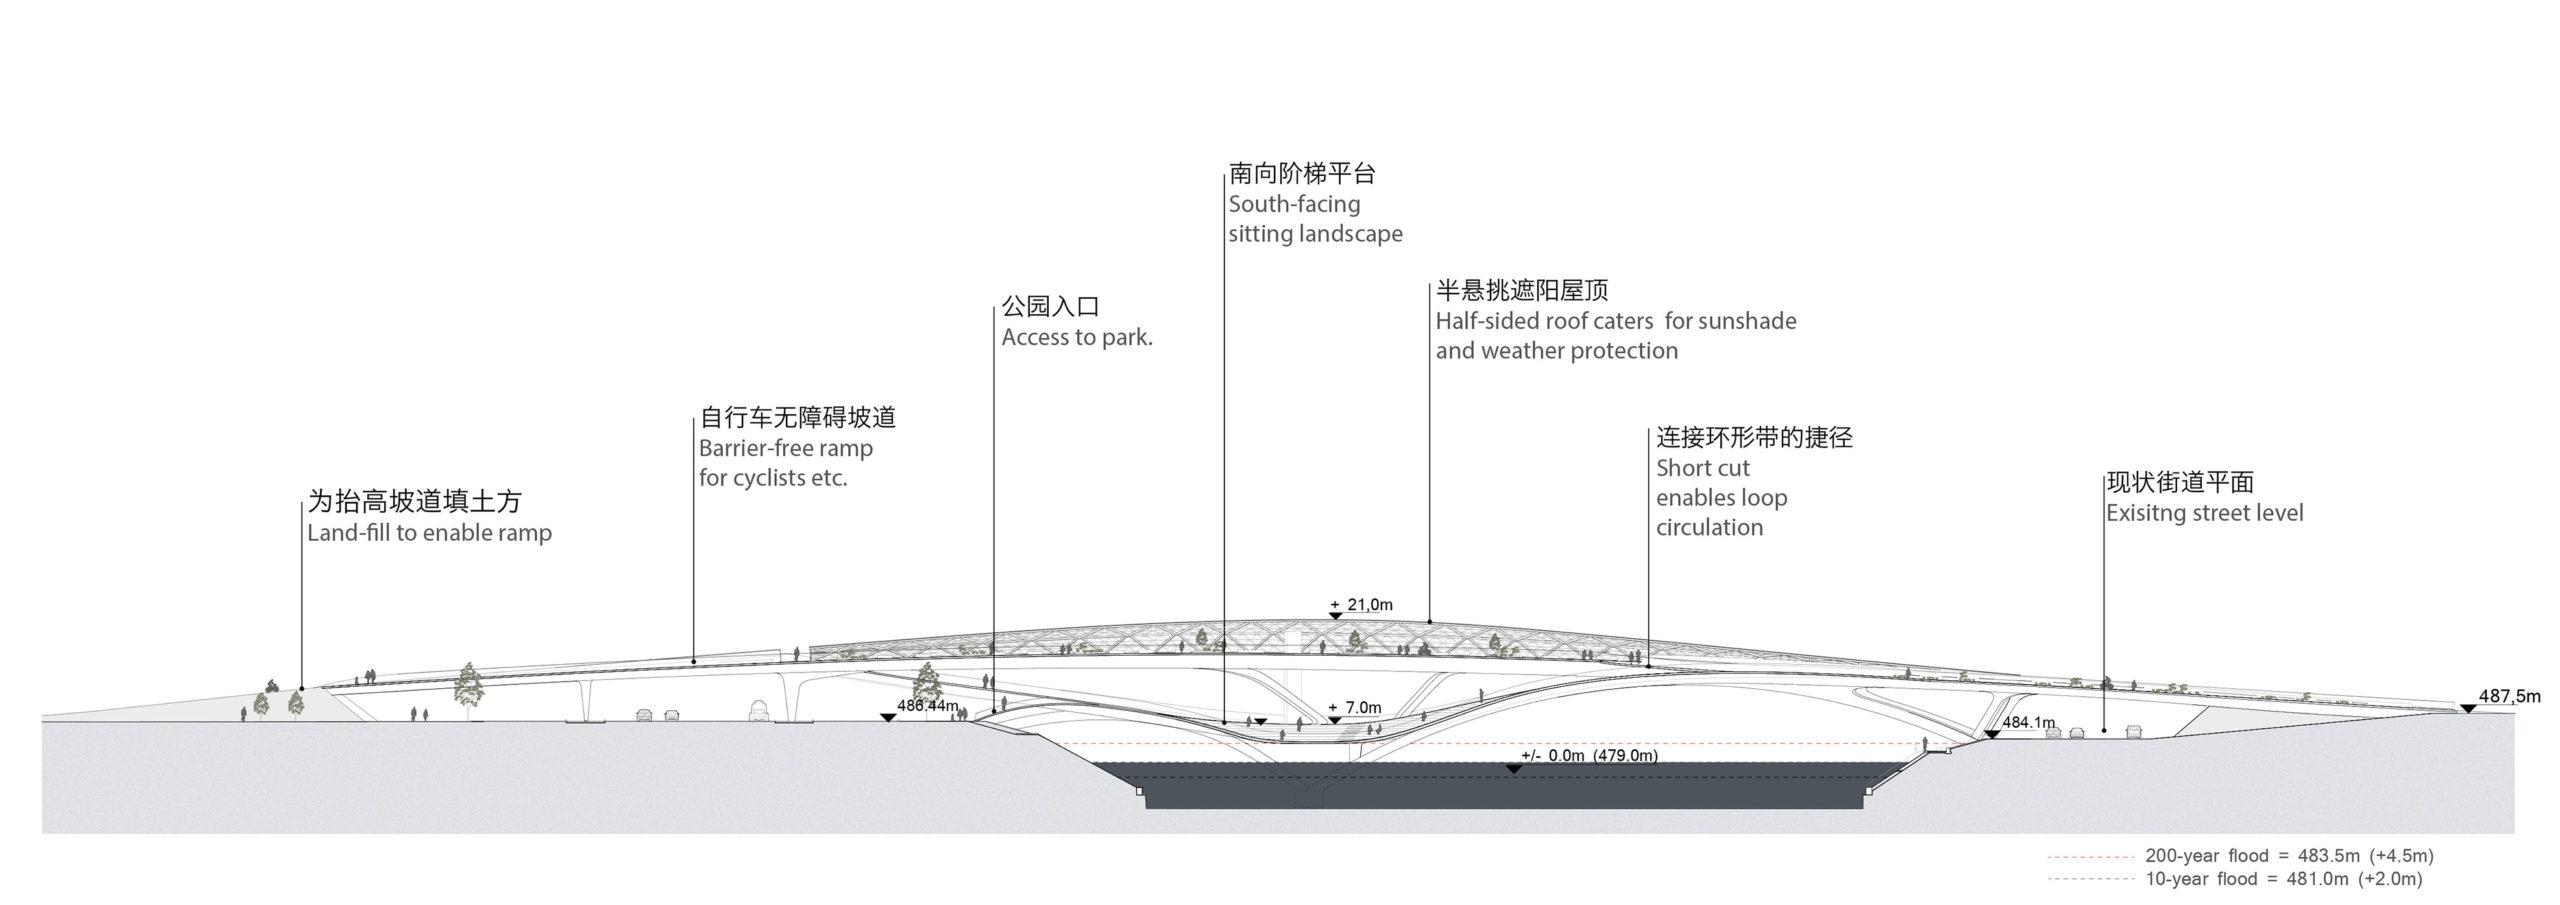 section view 五岔子大橋 - Wuchazi Bridge (INFINITE LOOP)